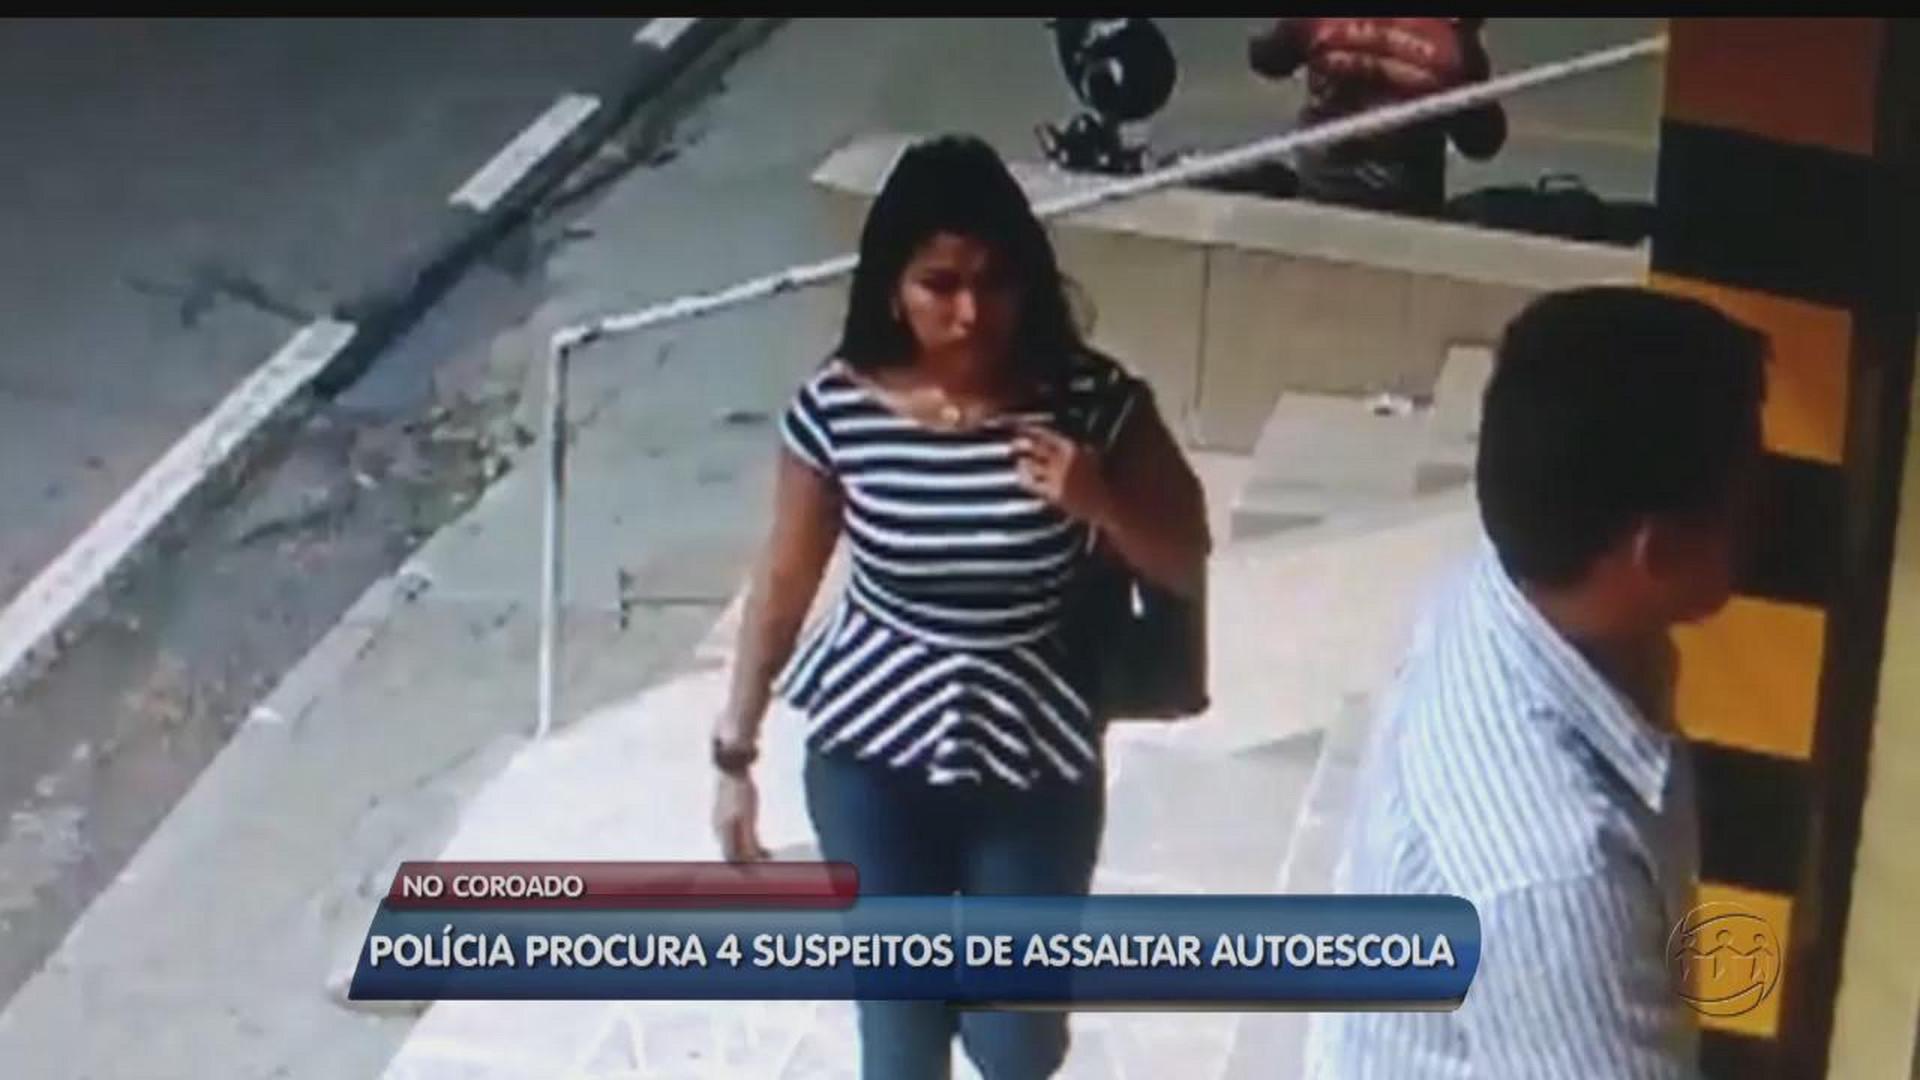 QUADRILHA ASSALTA AUTOESCOLA NO COROADO